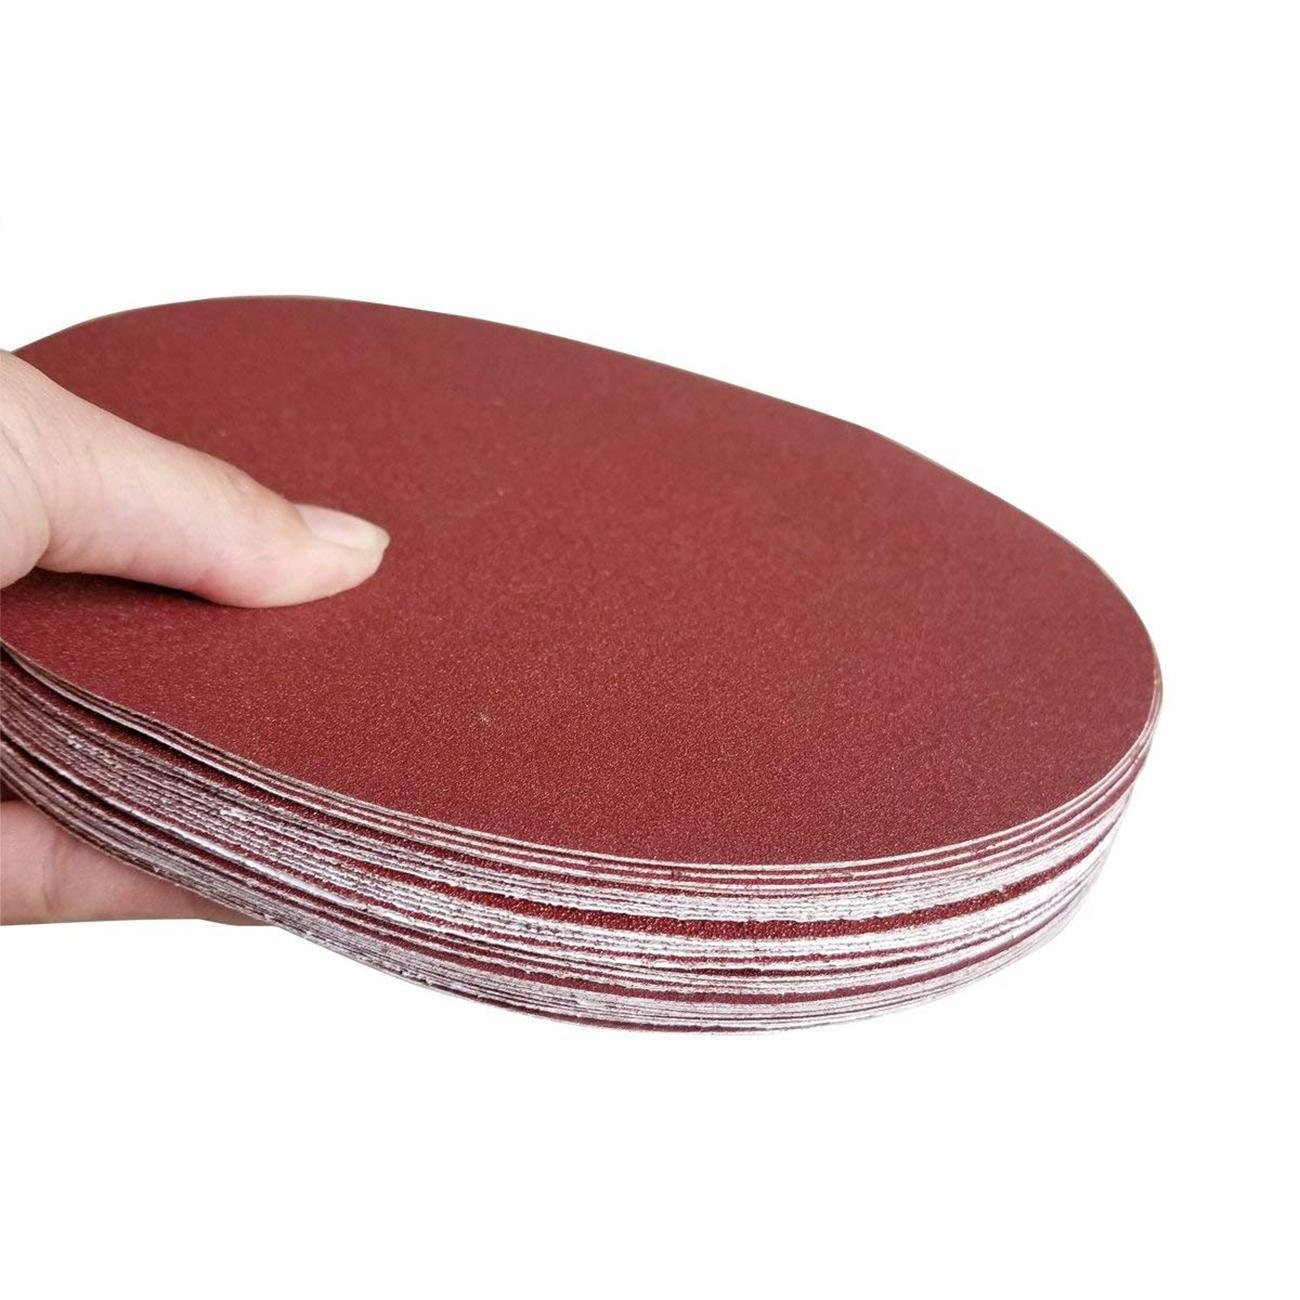 Dyna-Living 30 PCS 9-Inch NO-Hole PSA Aluminum Oxide Sanding Disc, Self Stick(5 Each of 80 100 120 180 240 400)